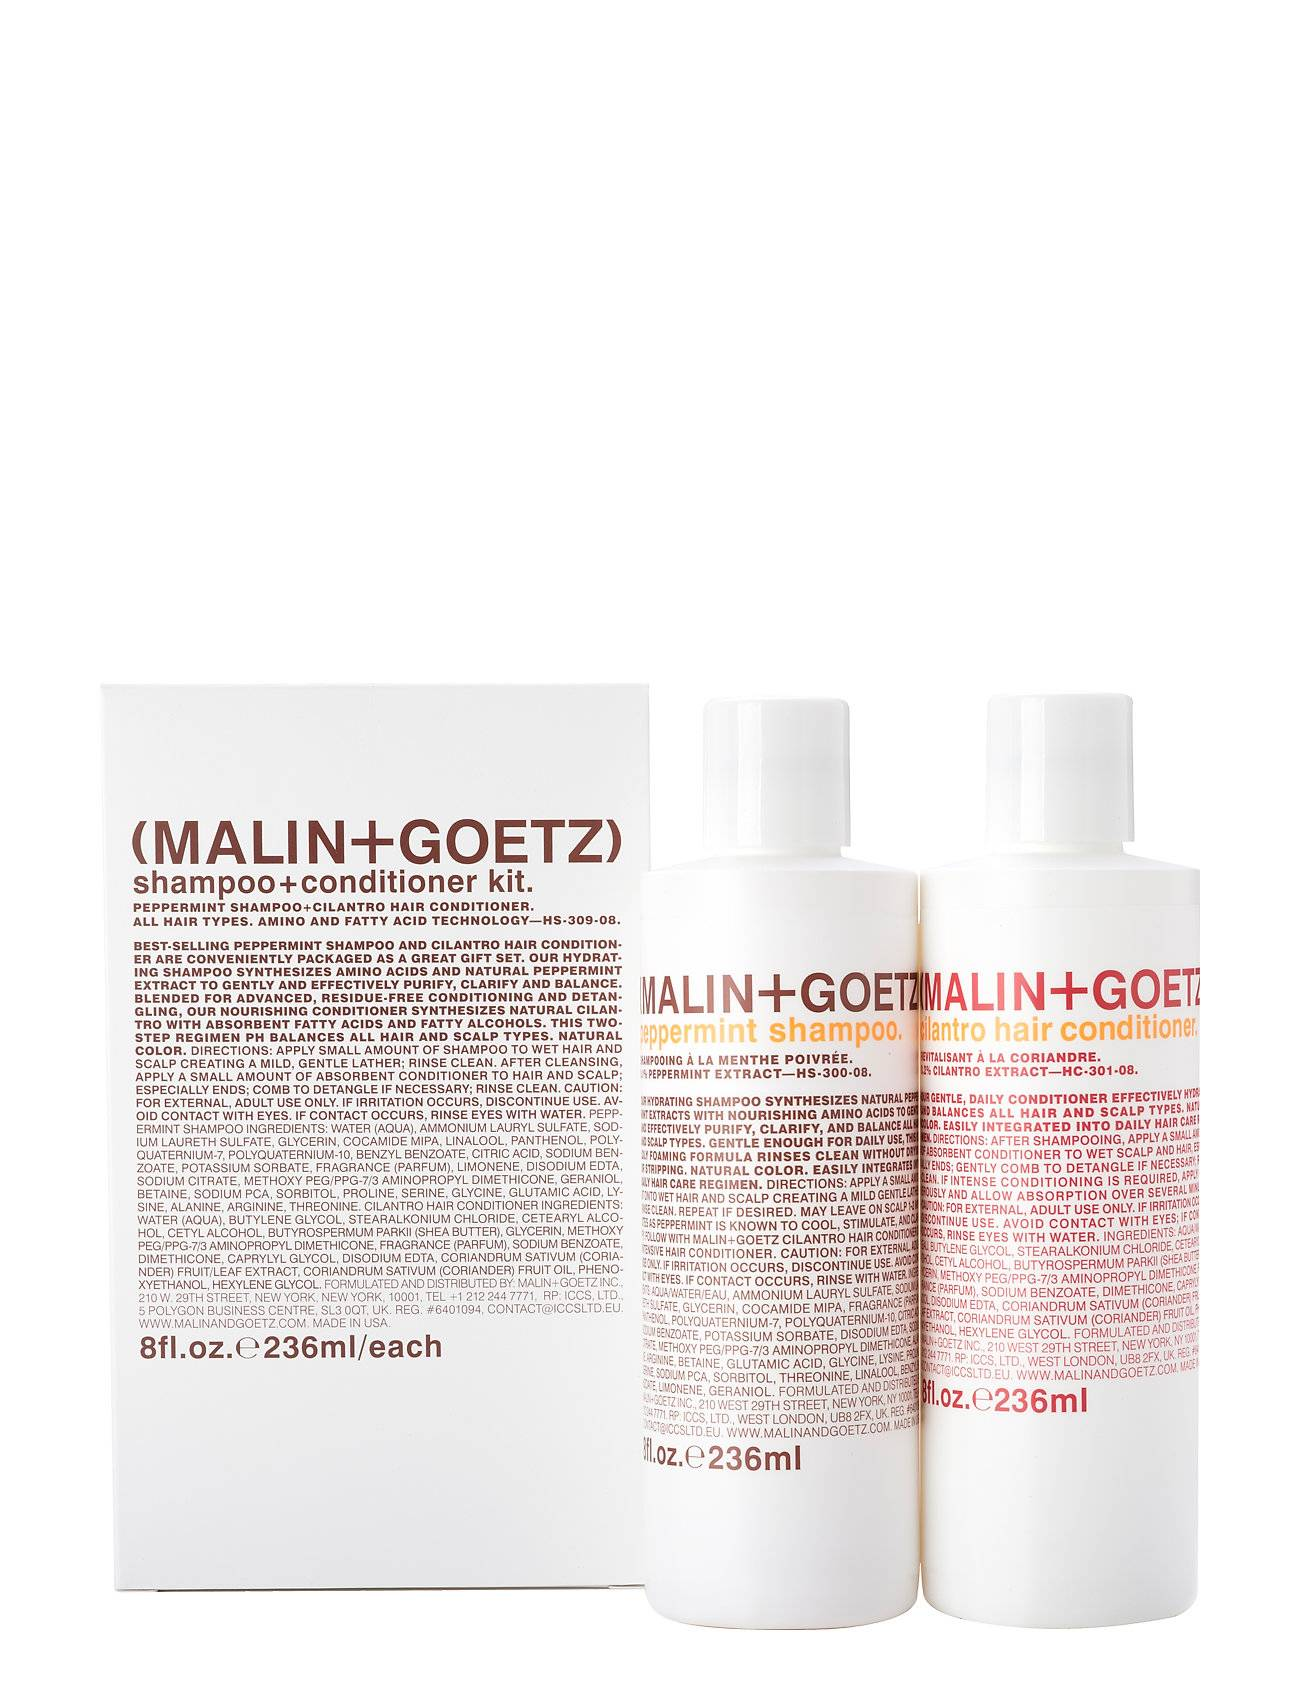 Malin+Goetz Shampoo & Conditioner Kit